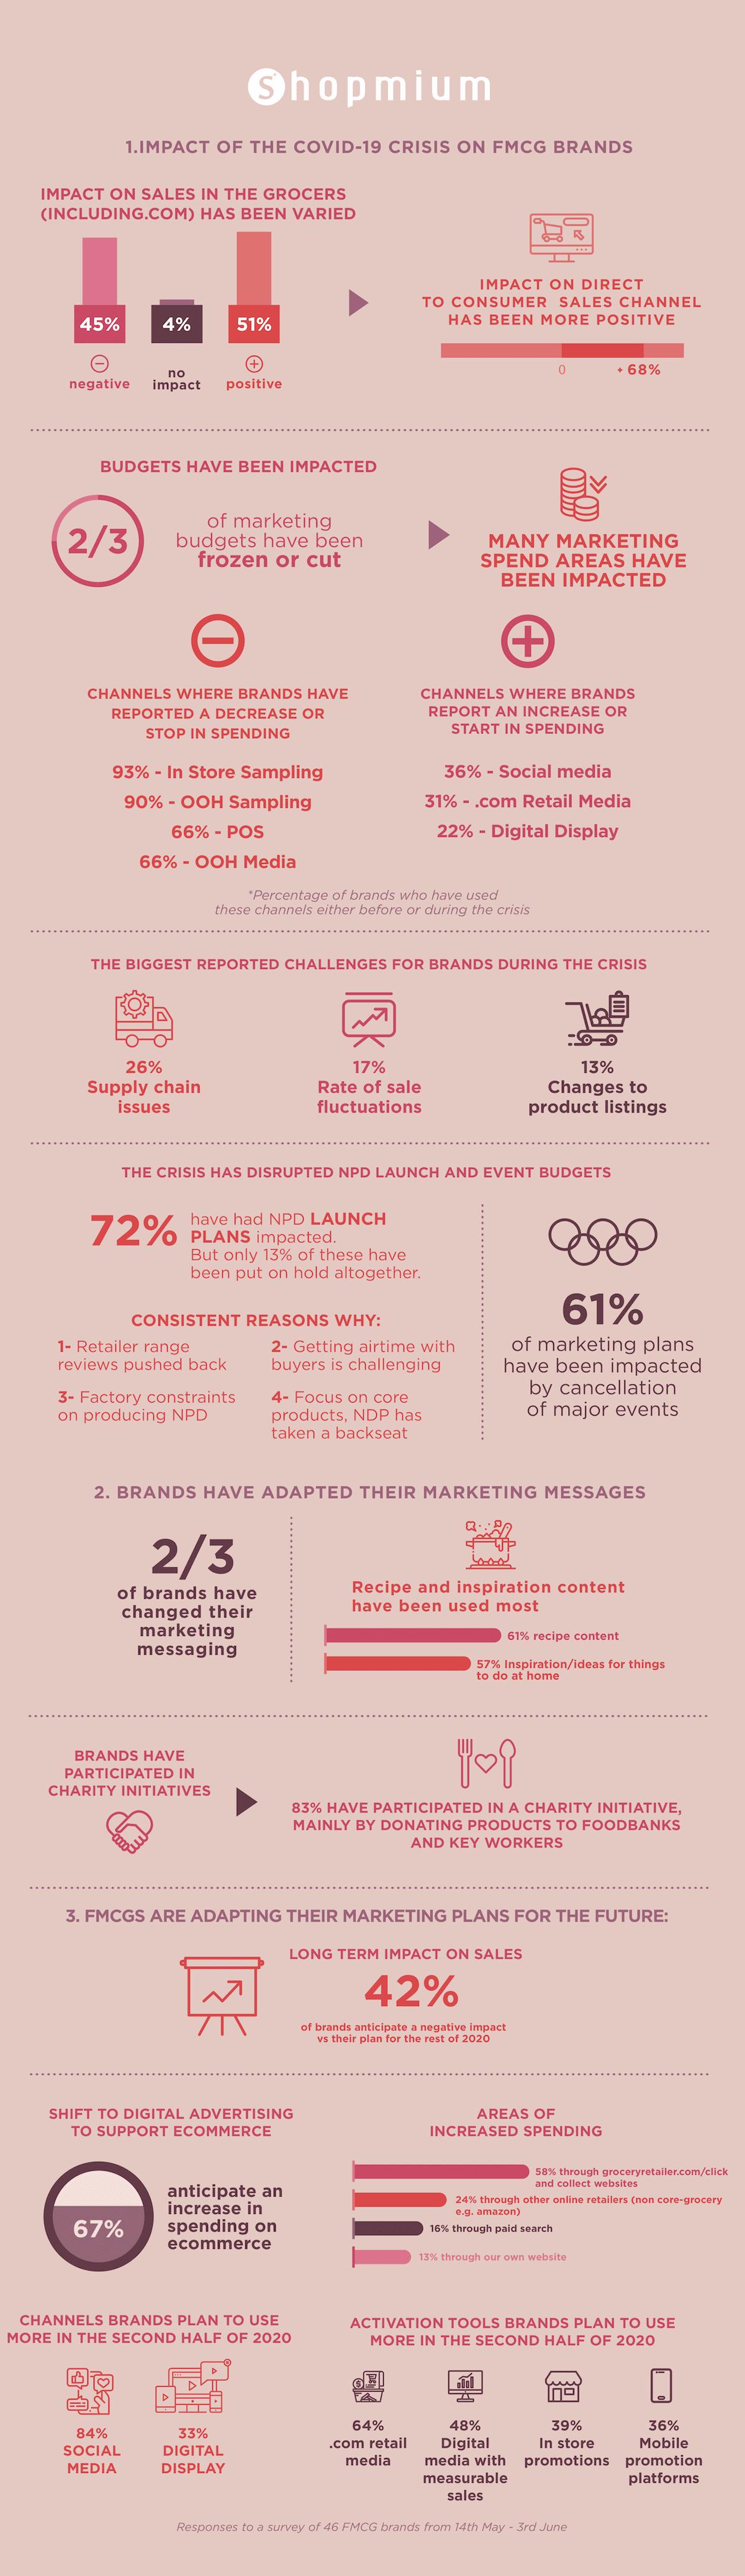 UK FMCG brands survey infographic